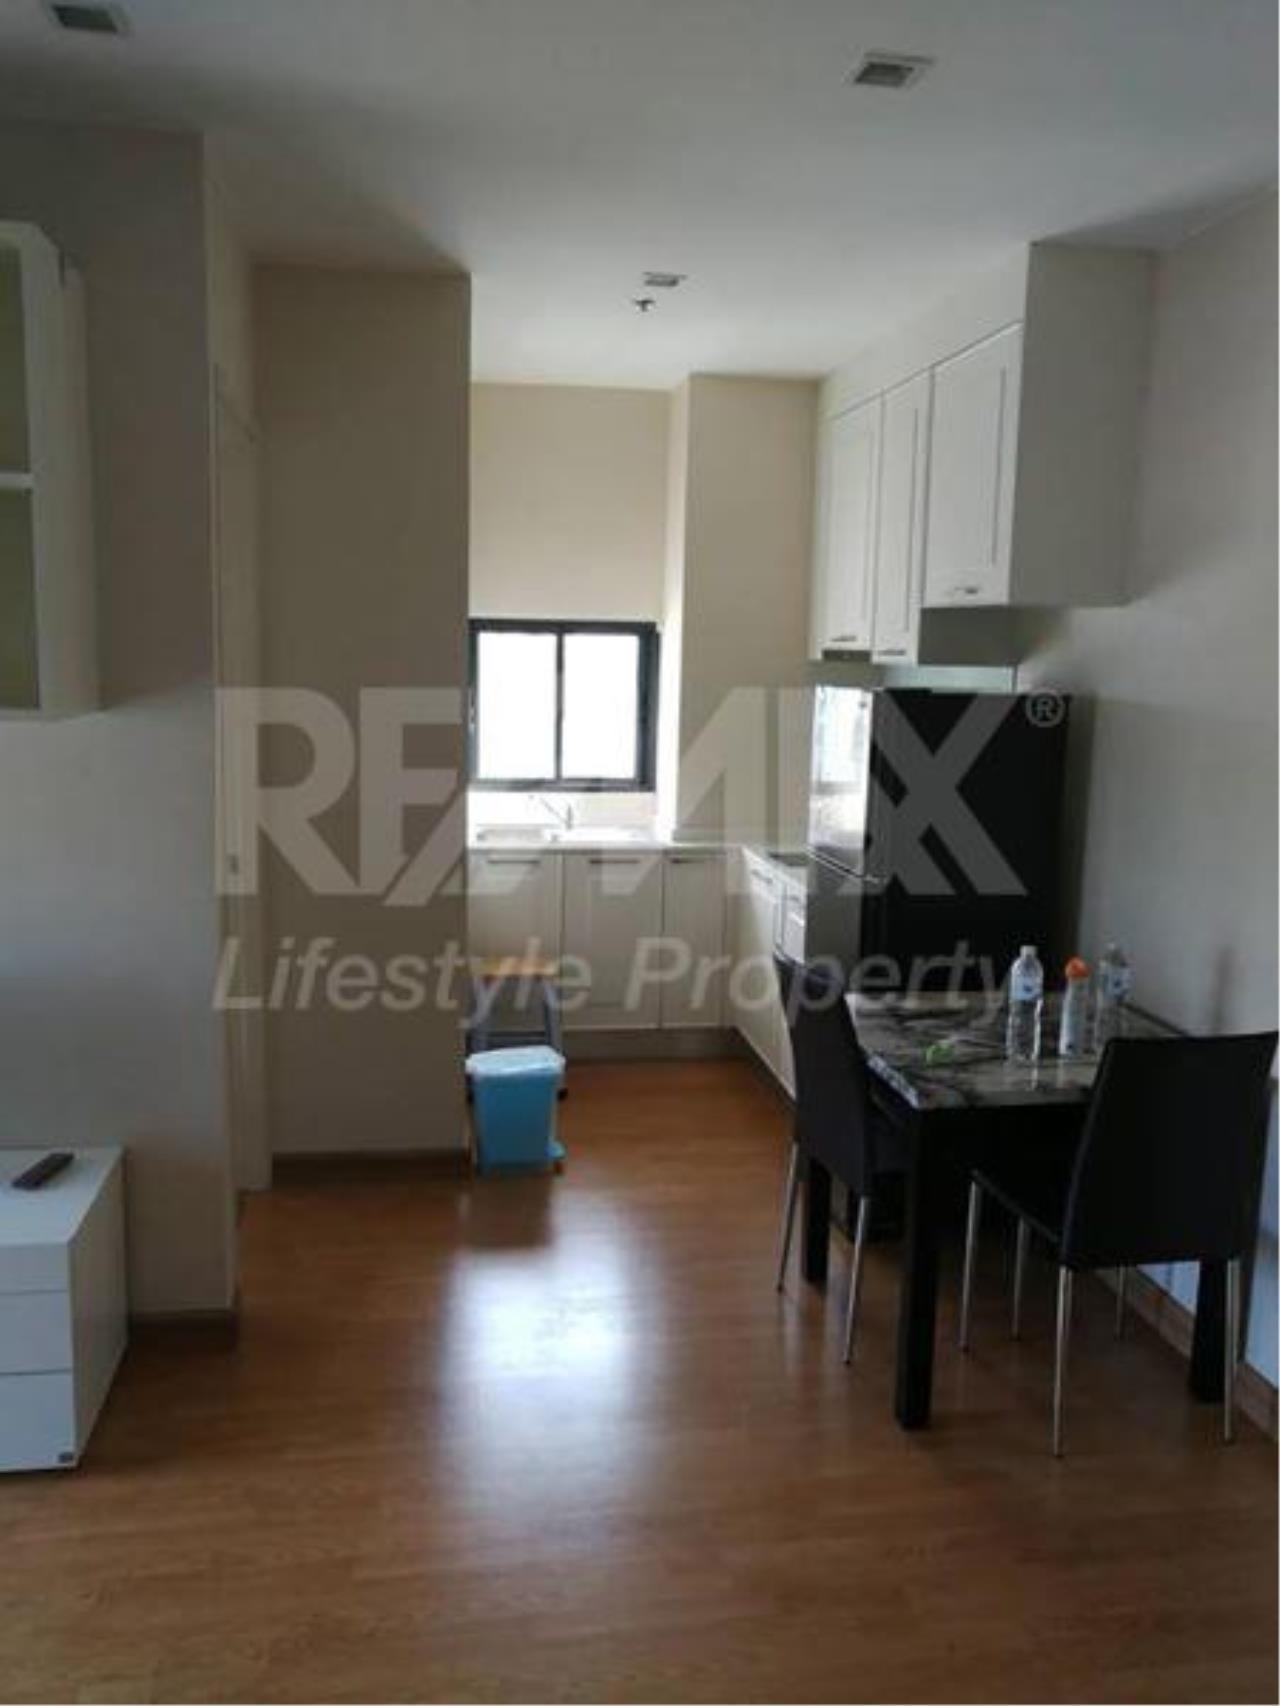 RE/MAX LifeStyle Property Agency's Q. House Condo Sukhumvit 79 2